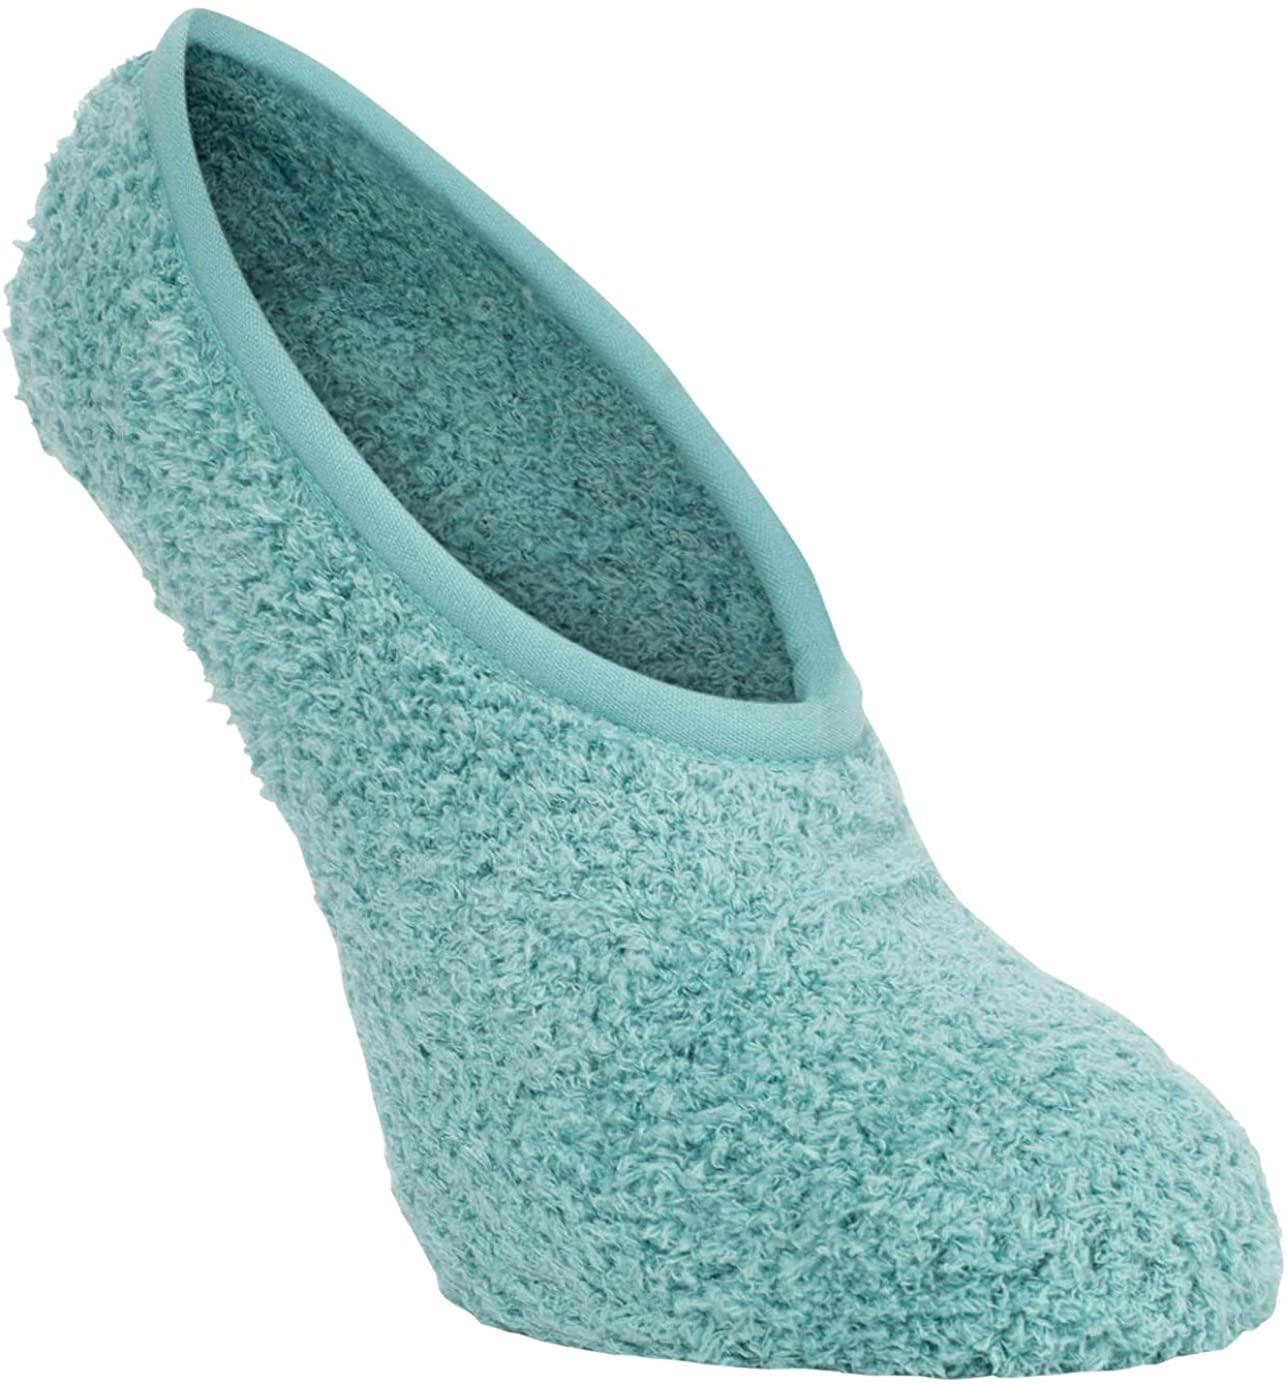 World's Softest Women's One Size Sea Foam Blue Cozy No-Show Footsie Socks